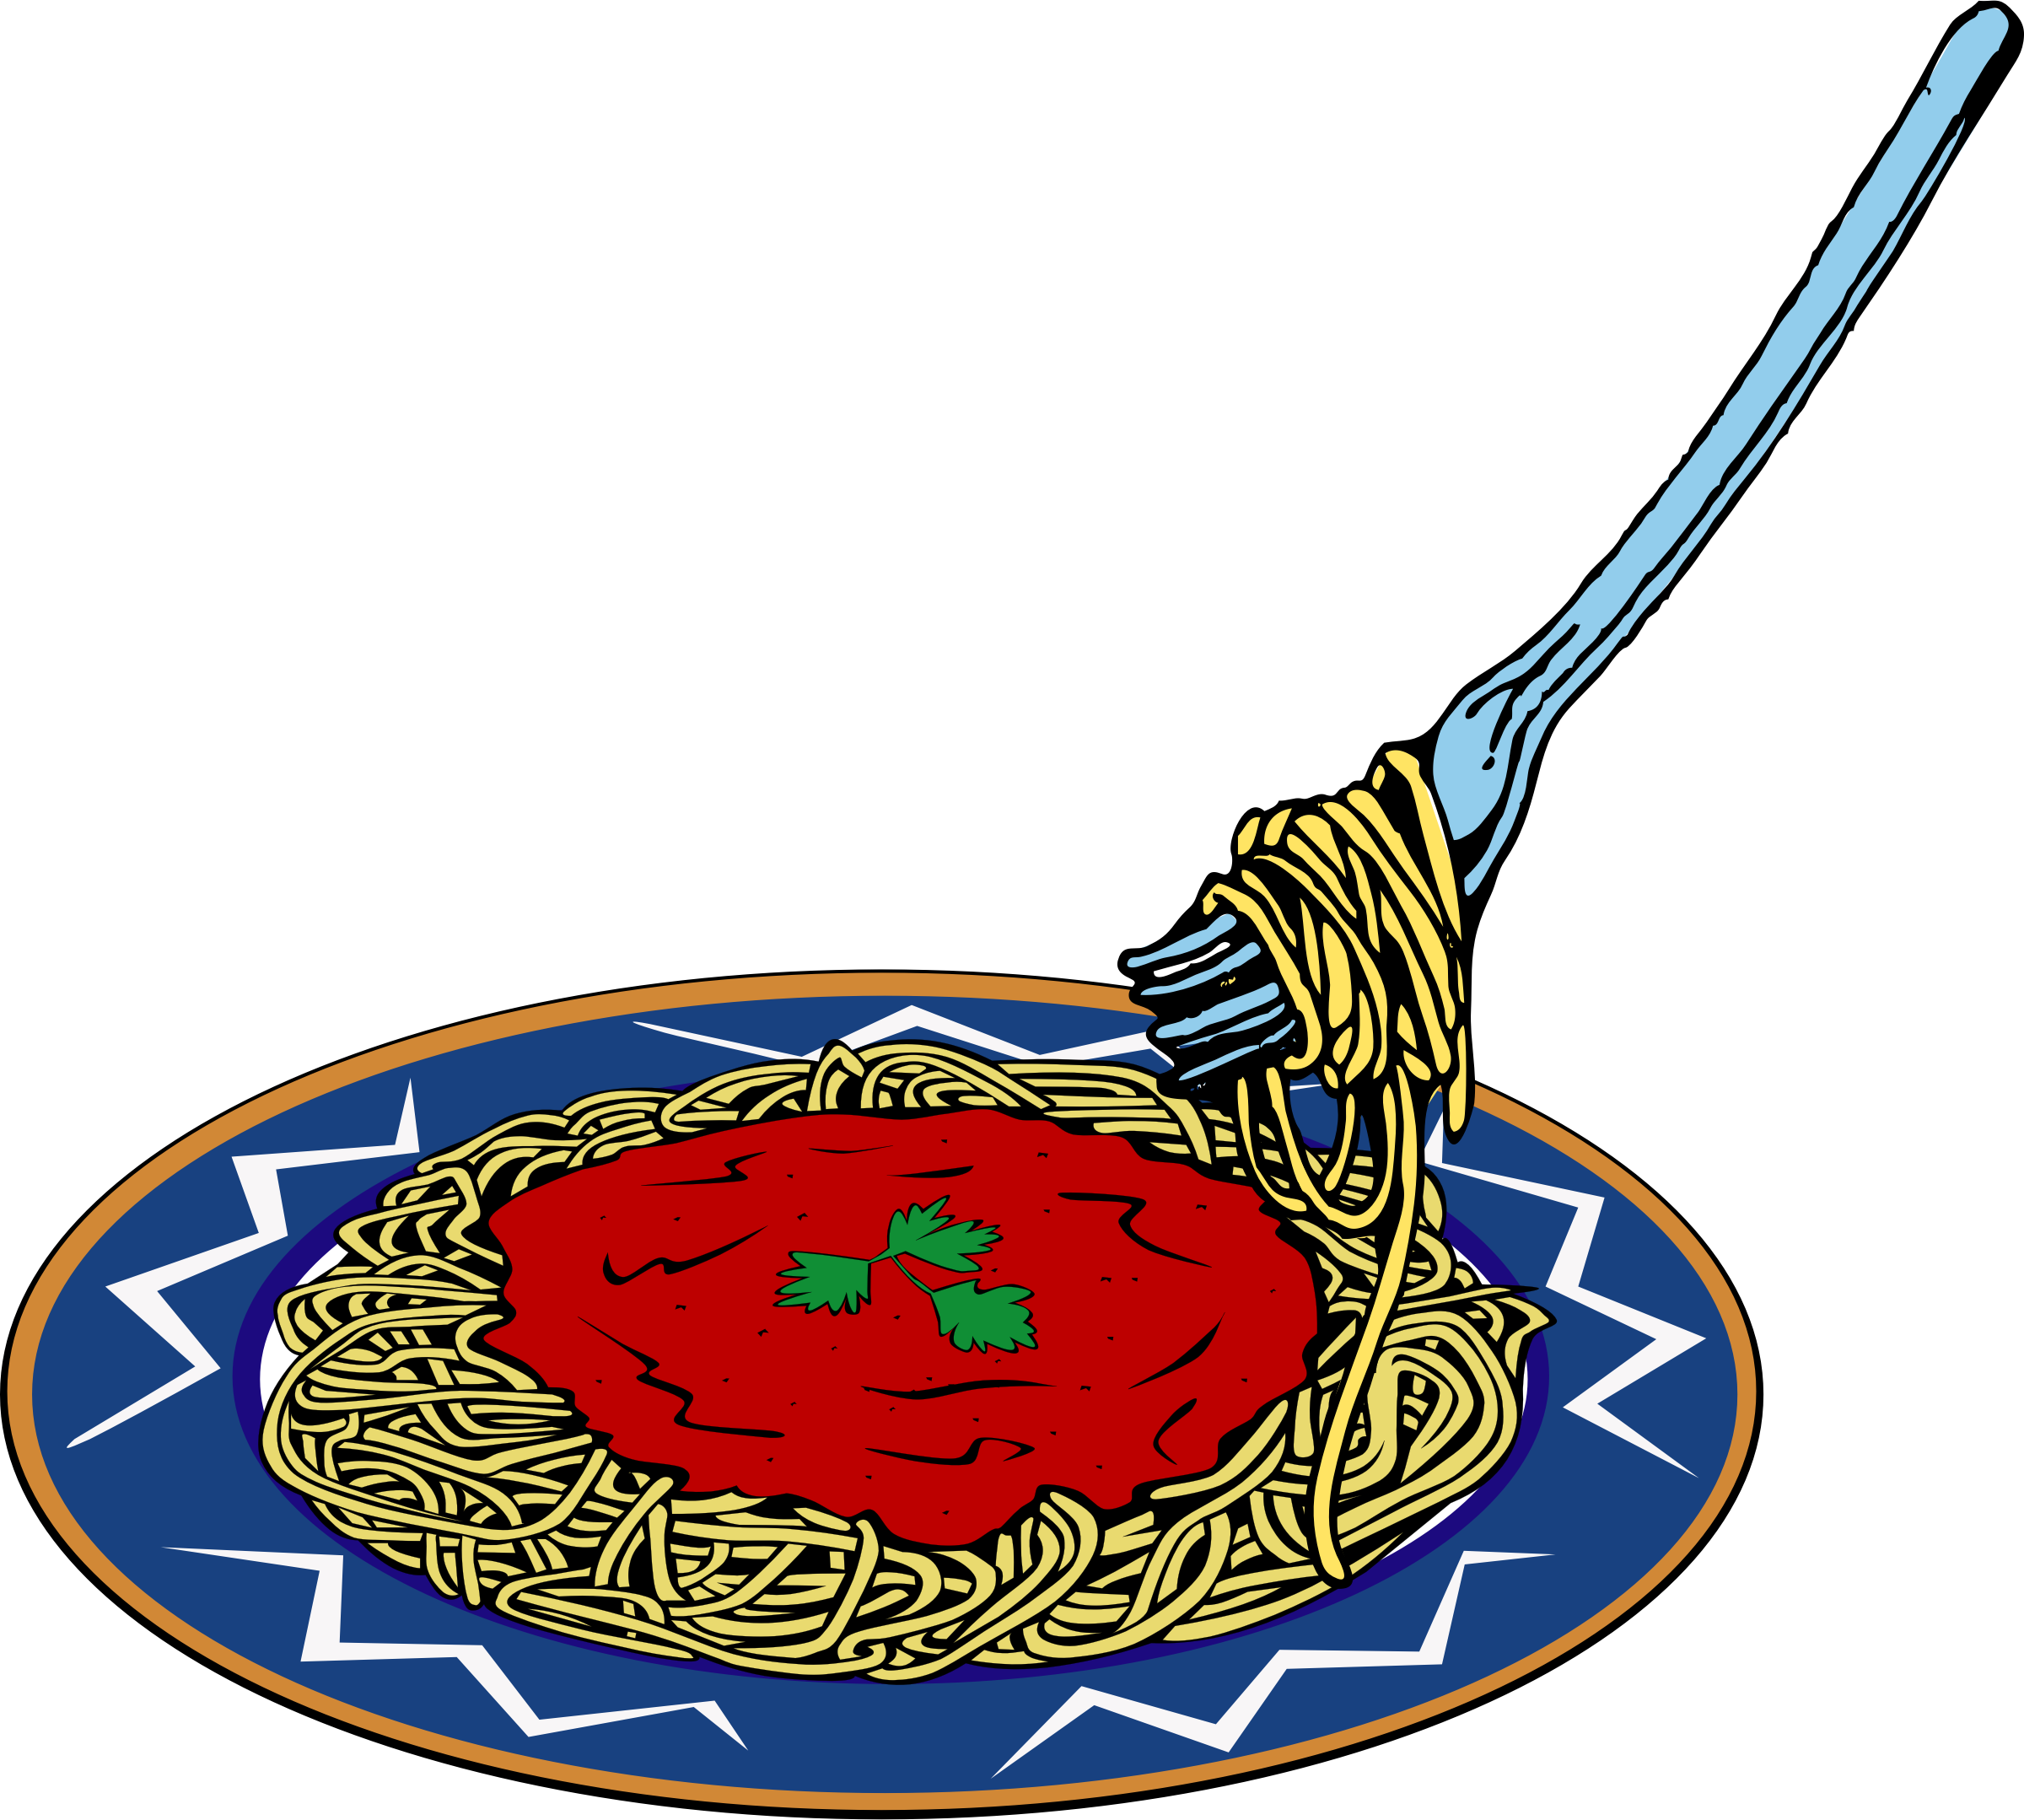 Noodle clipart plate spaghetti Spaghetti Clipart Free Best Clipartion